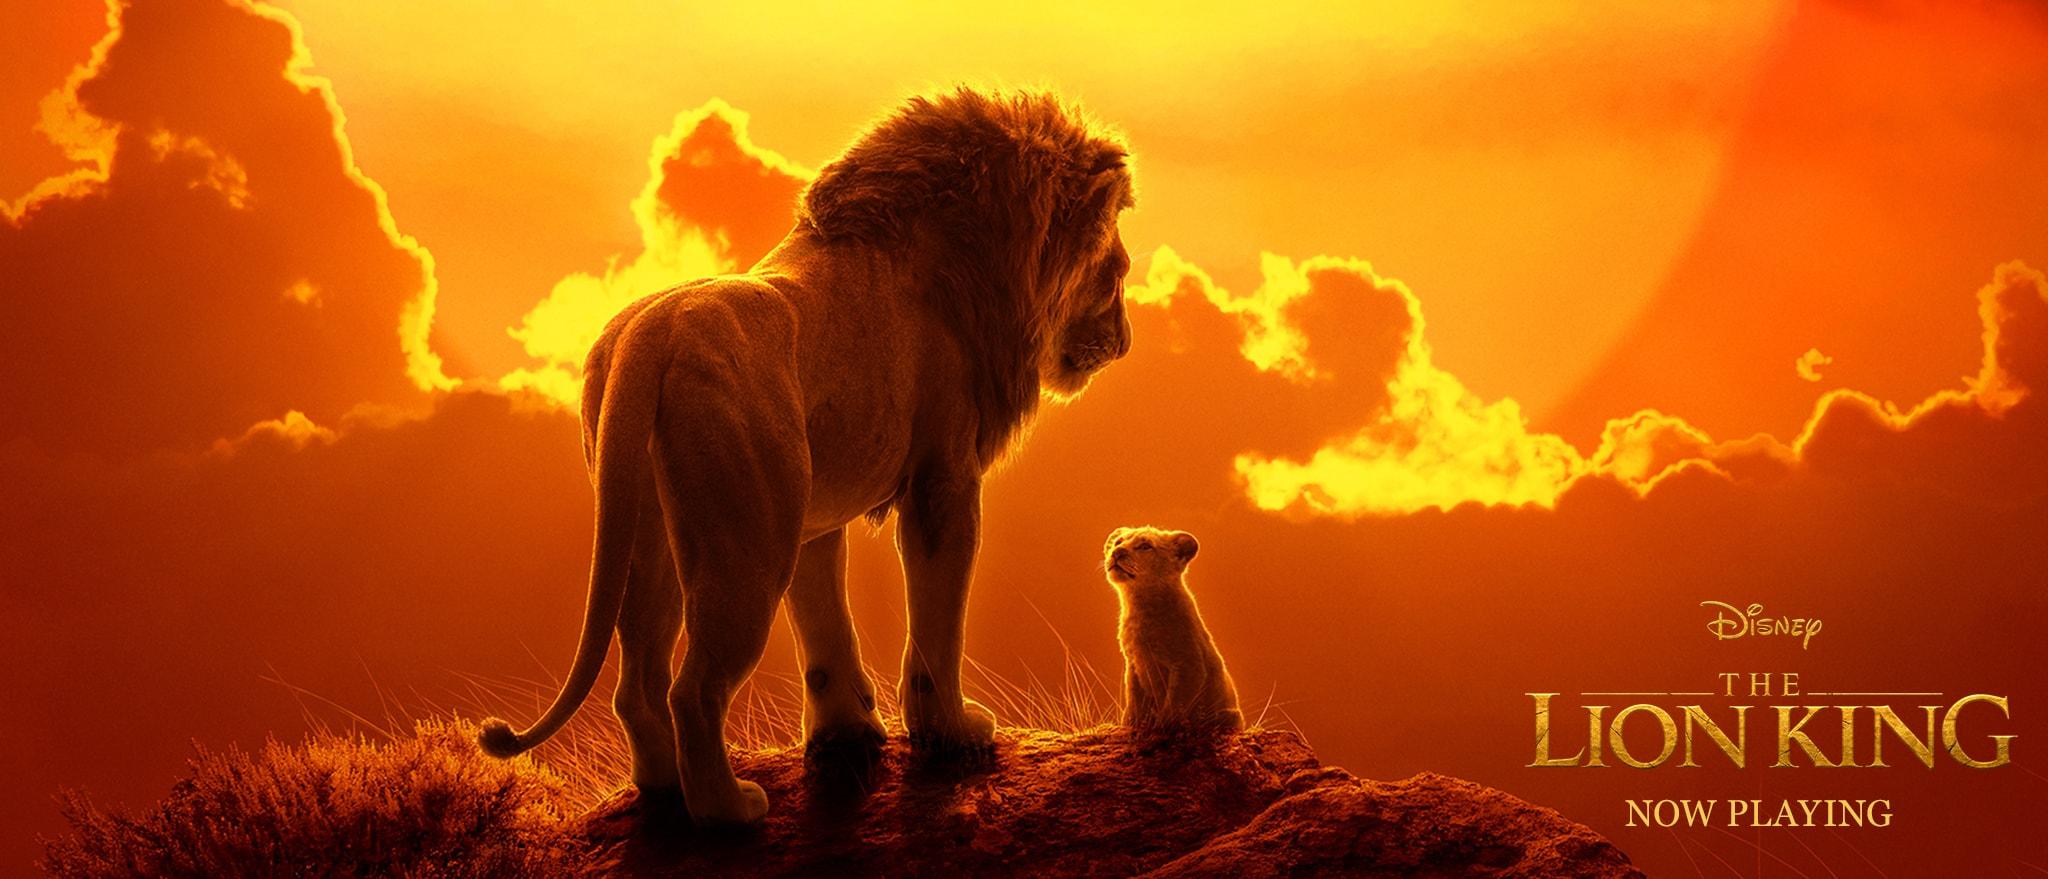 2019 lion king, lion king review, disney's lion king, lion king remake